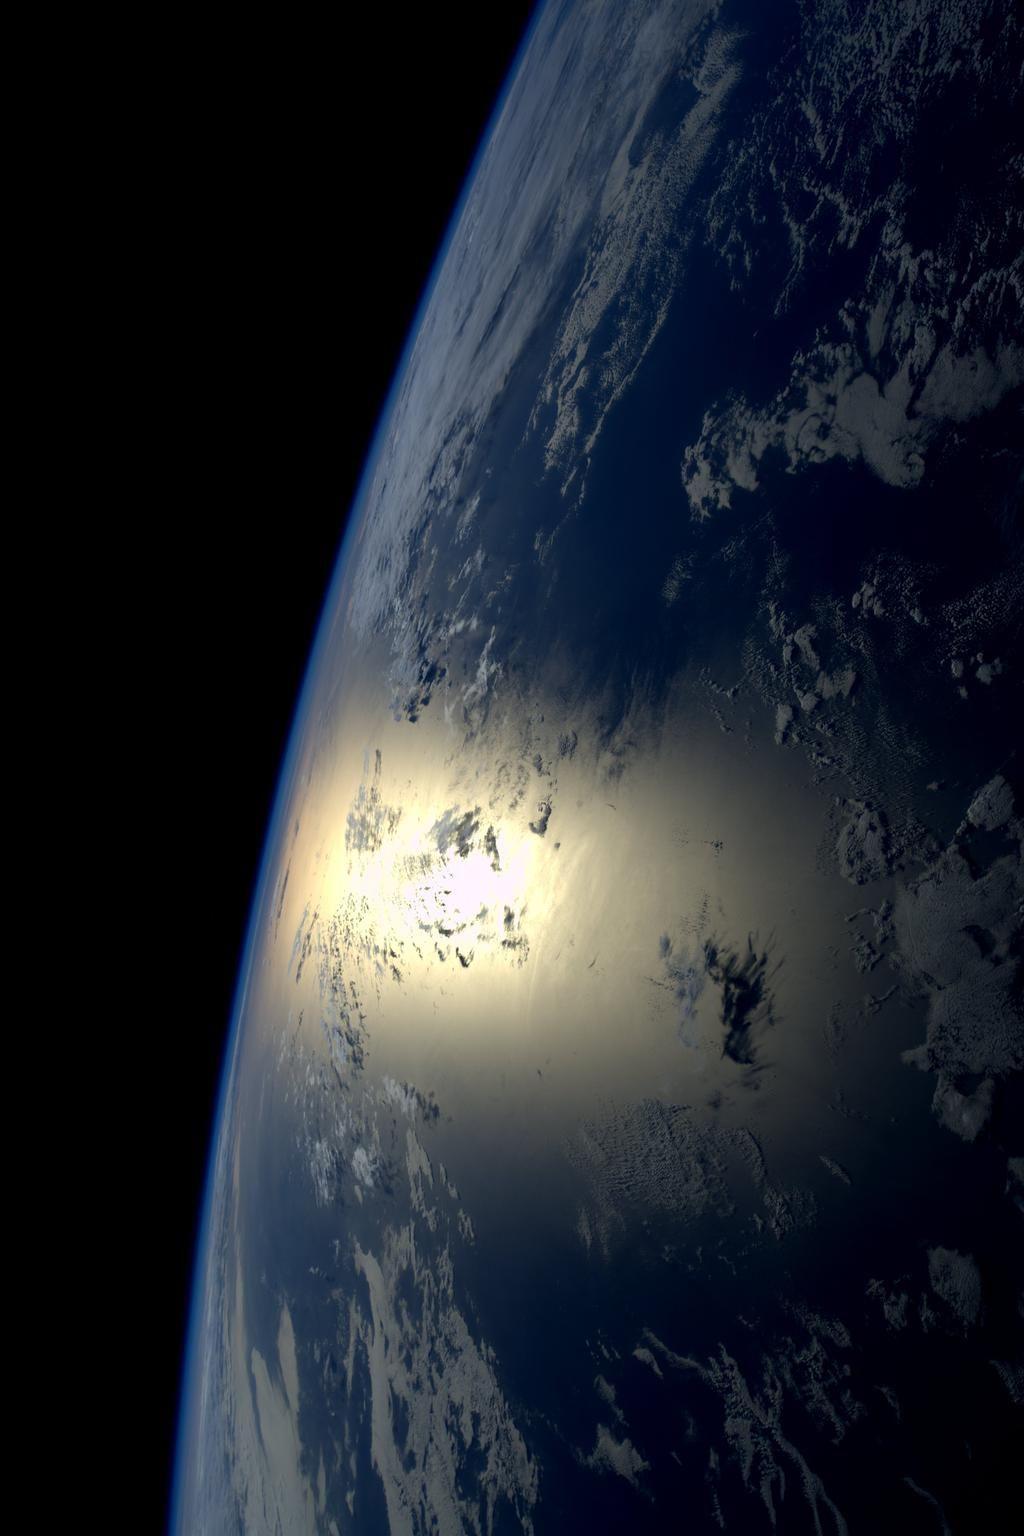 Good night from #space. Buona notte dolla spazio.